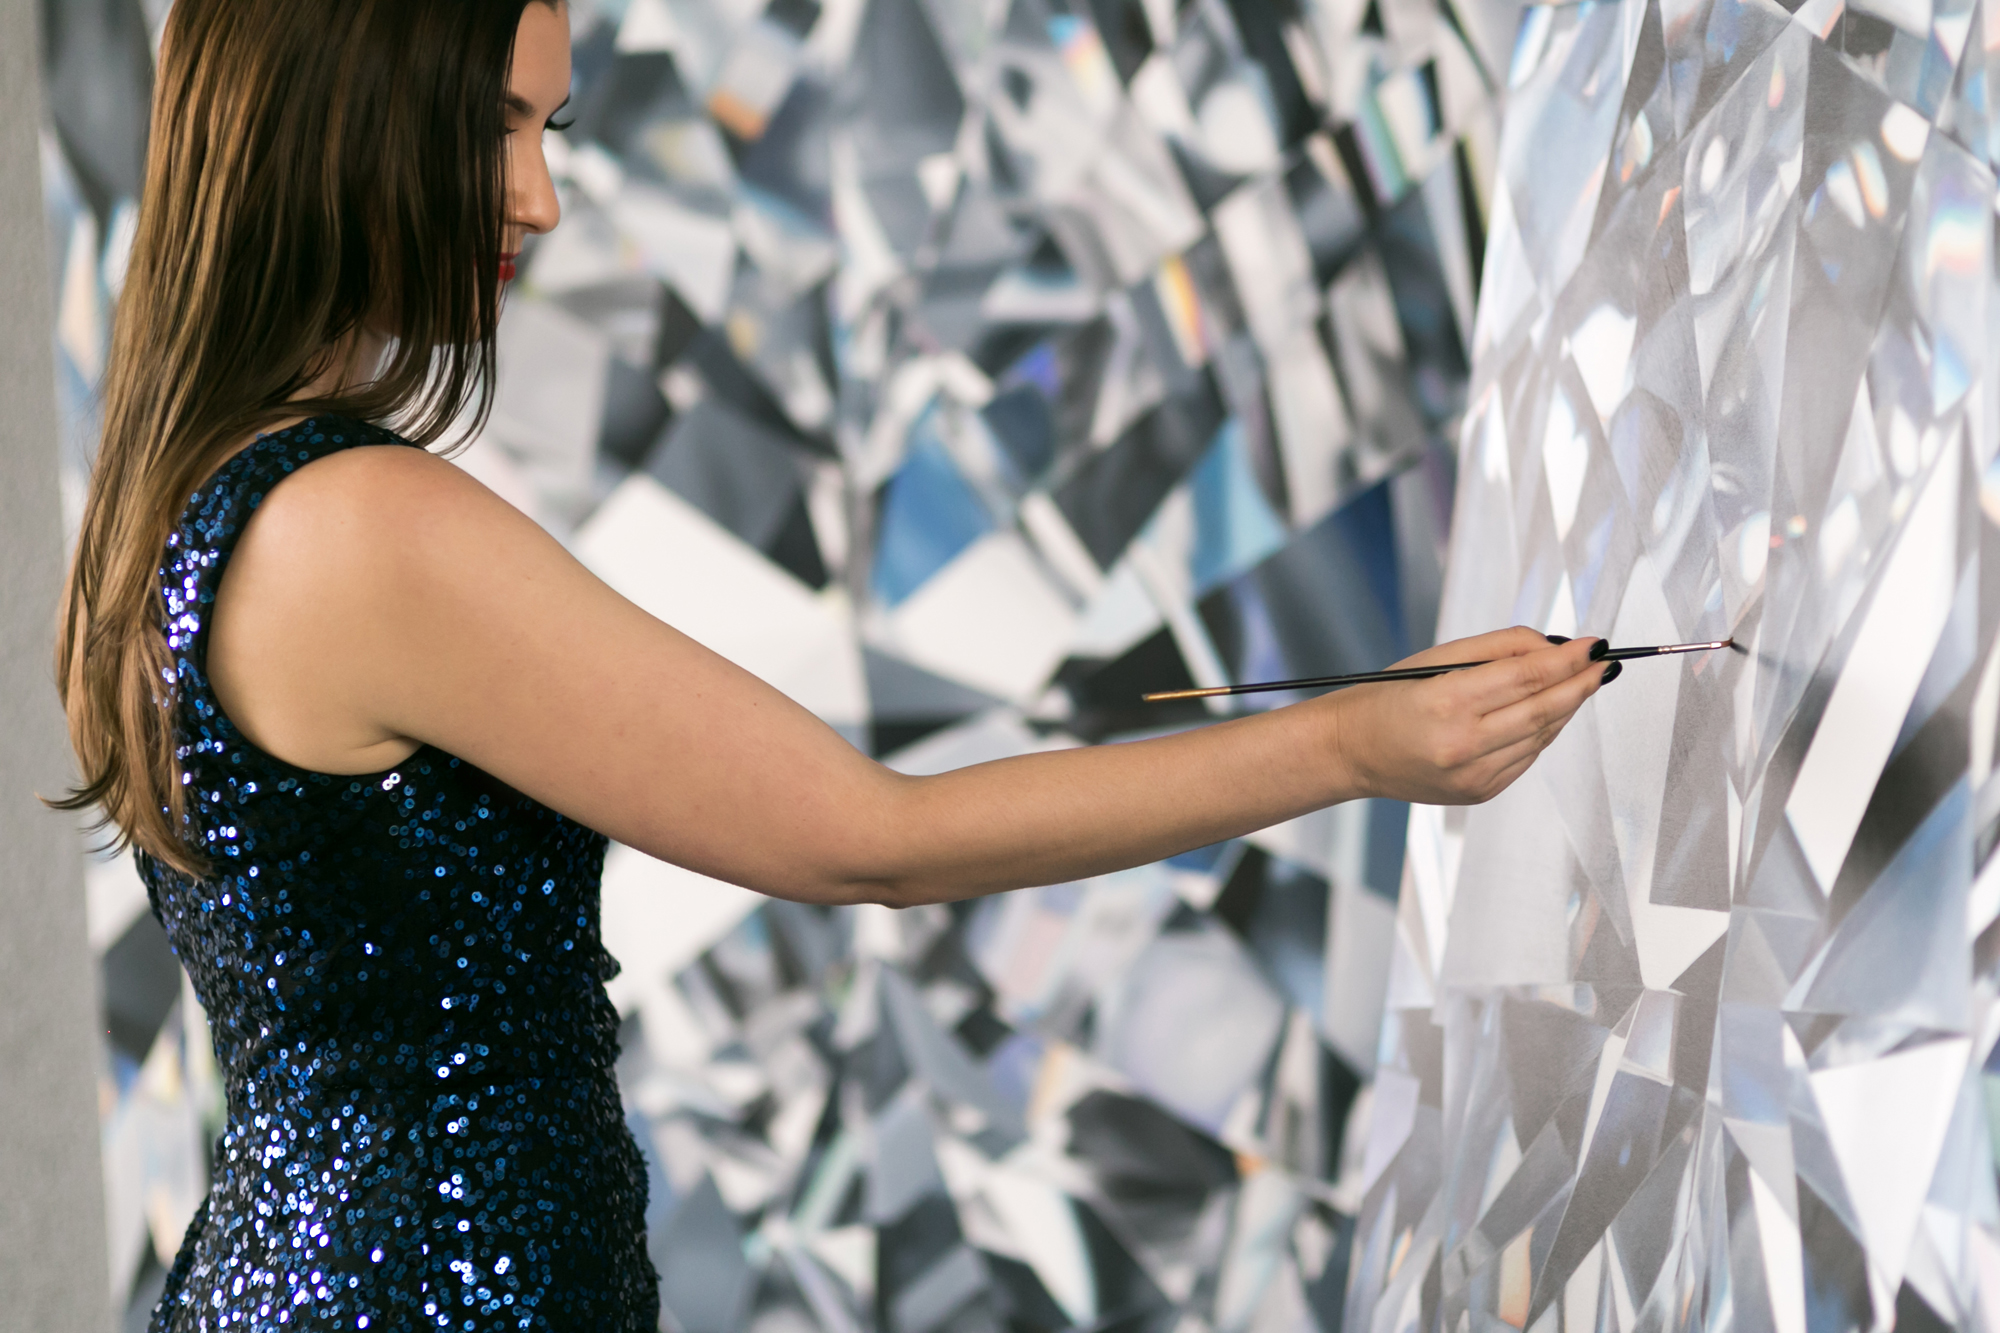 angie-crabgree-diamond-painter-artist-portrait-lilouette-3.jpg